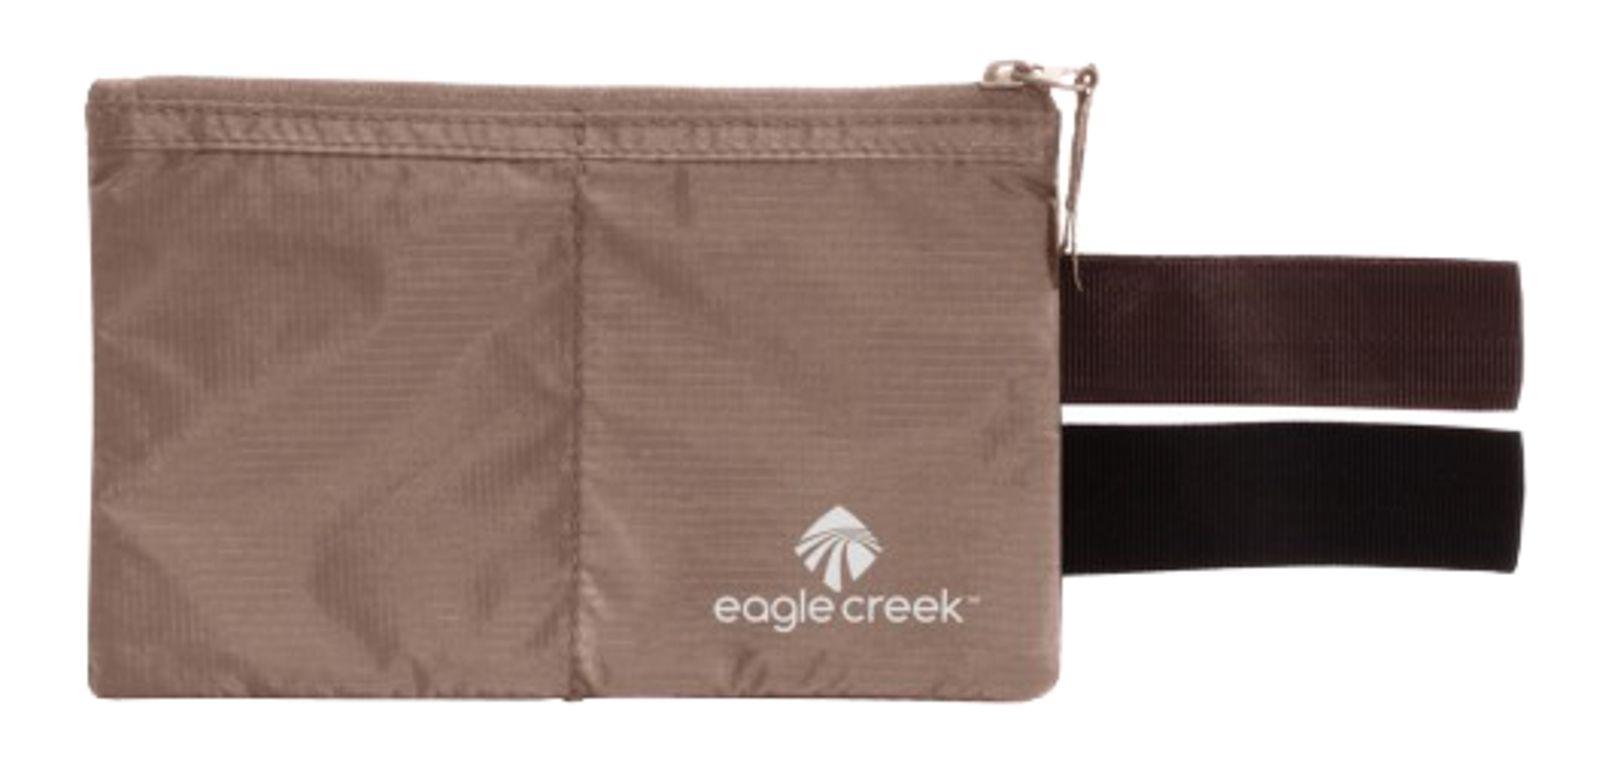 eagle creek Necessities Undercover Hidden Pocket Khaki